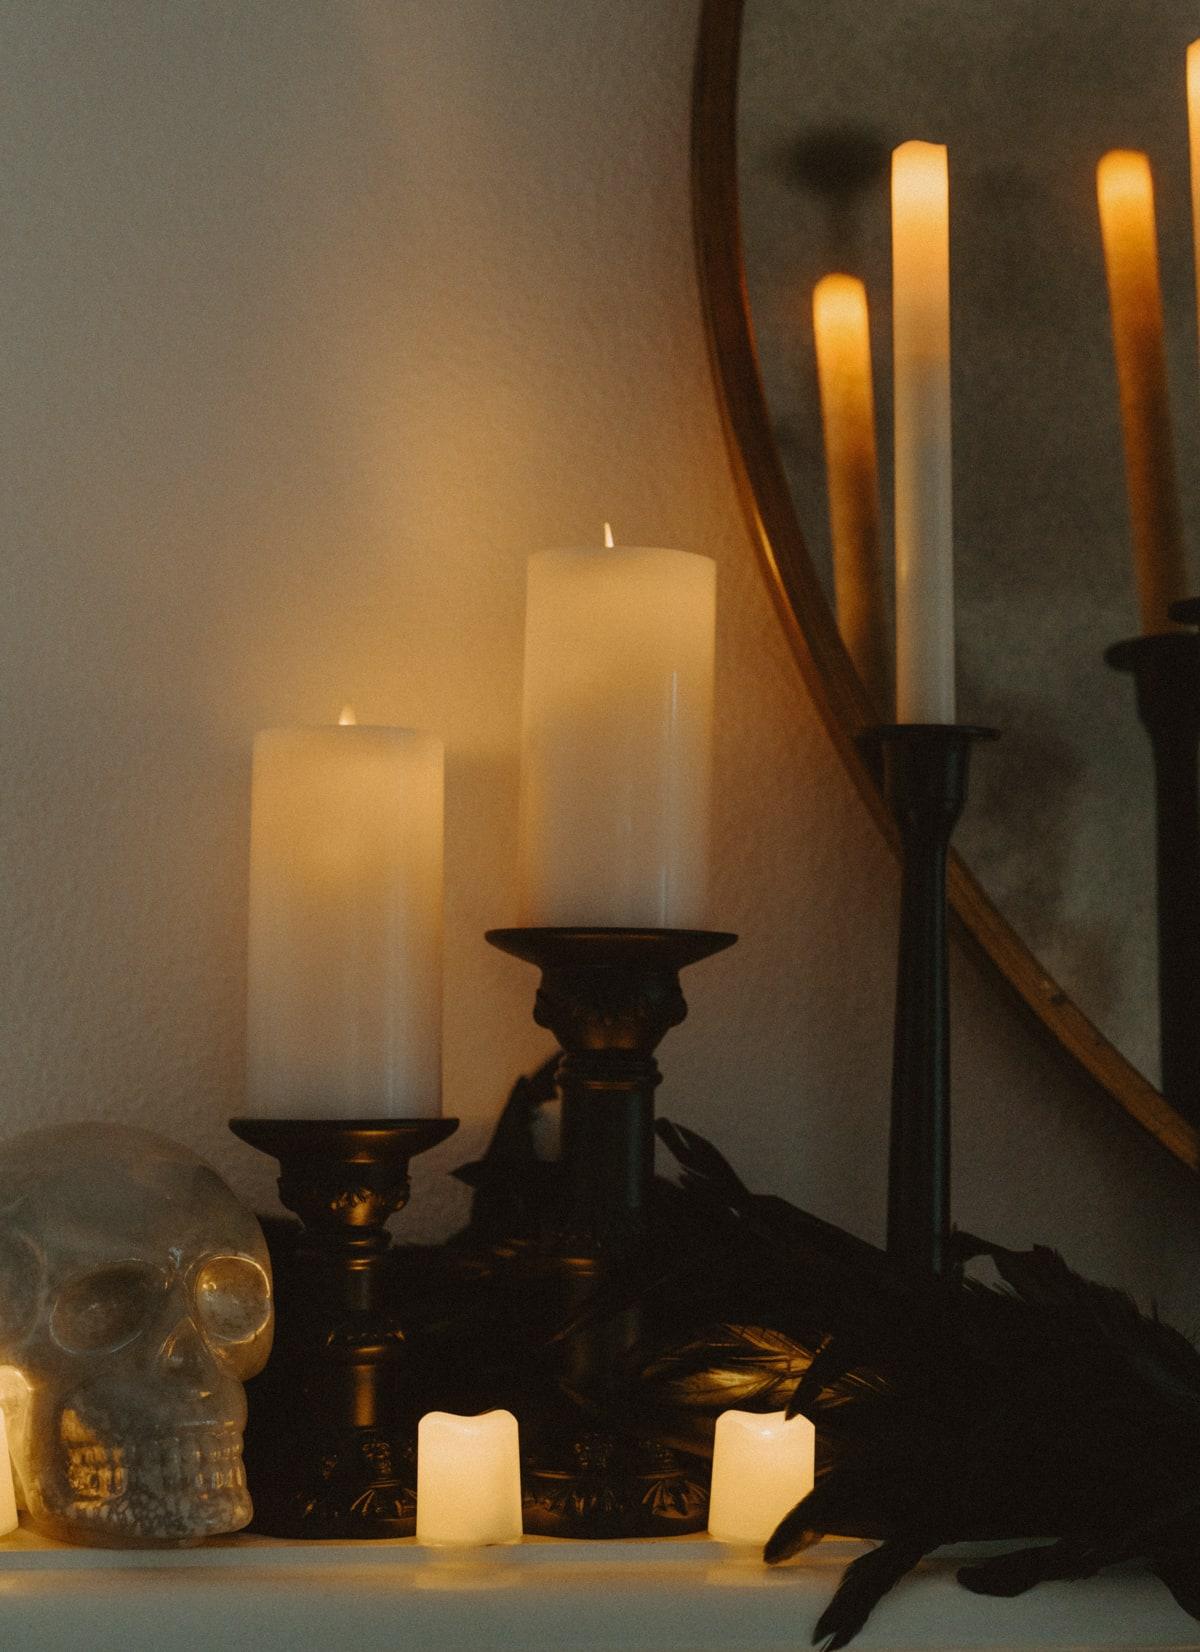 black candlesticks jcpenney